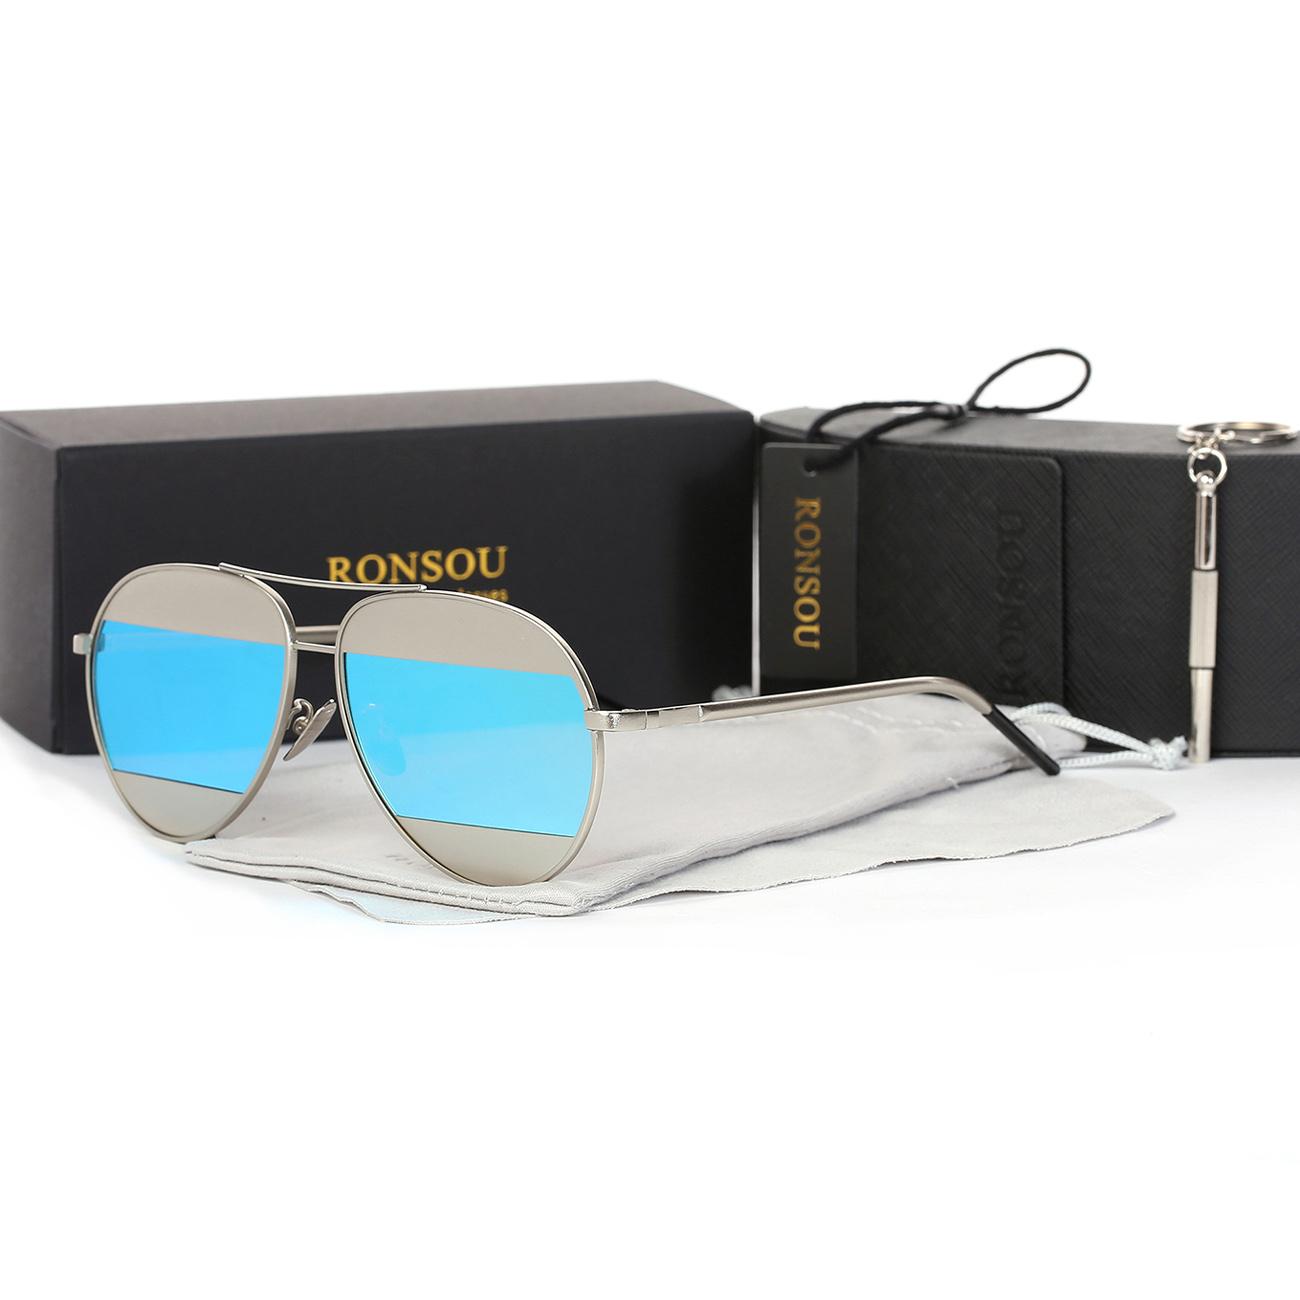 414b9c2efce Ronsou Stylish Aviator Polarized Sunglasses Metal Frame Glasses silver blue  lens